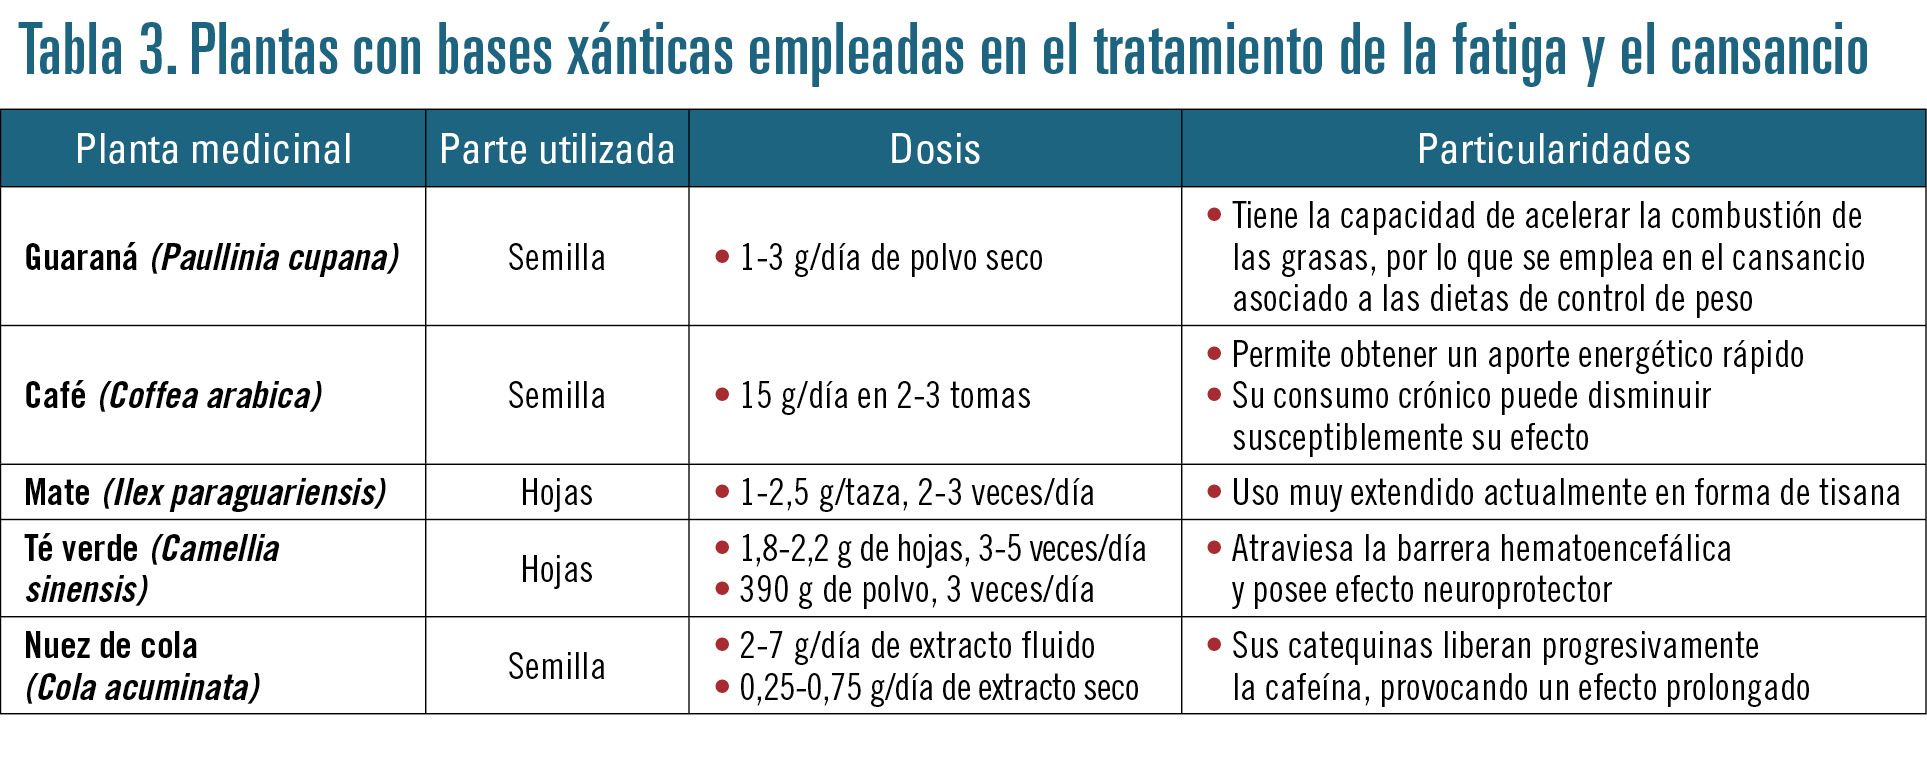 28 EF577 PROFESION FATIGA tabla 3